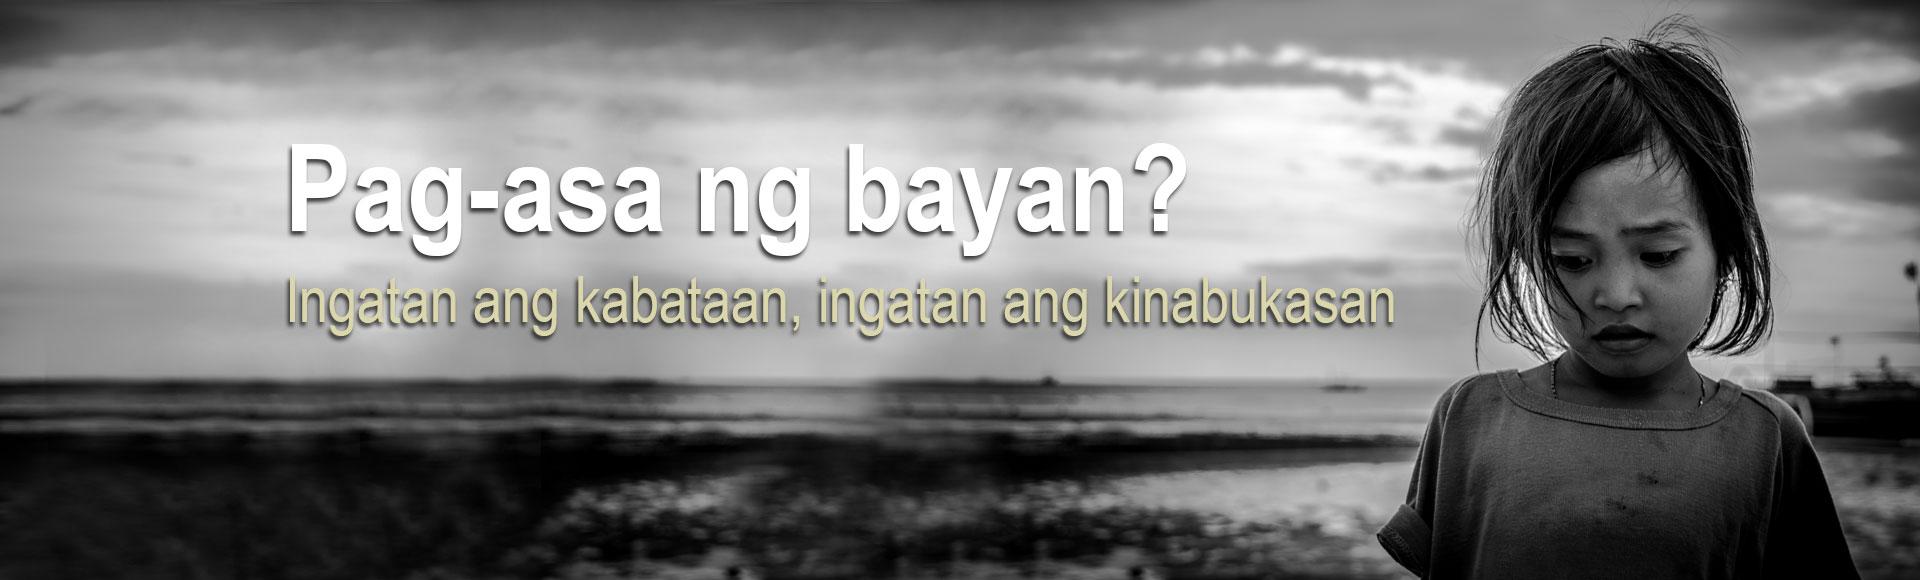 Attorneys-of-the-Philippines-Slider